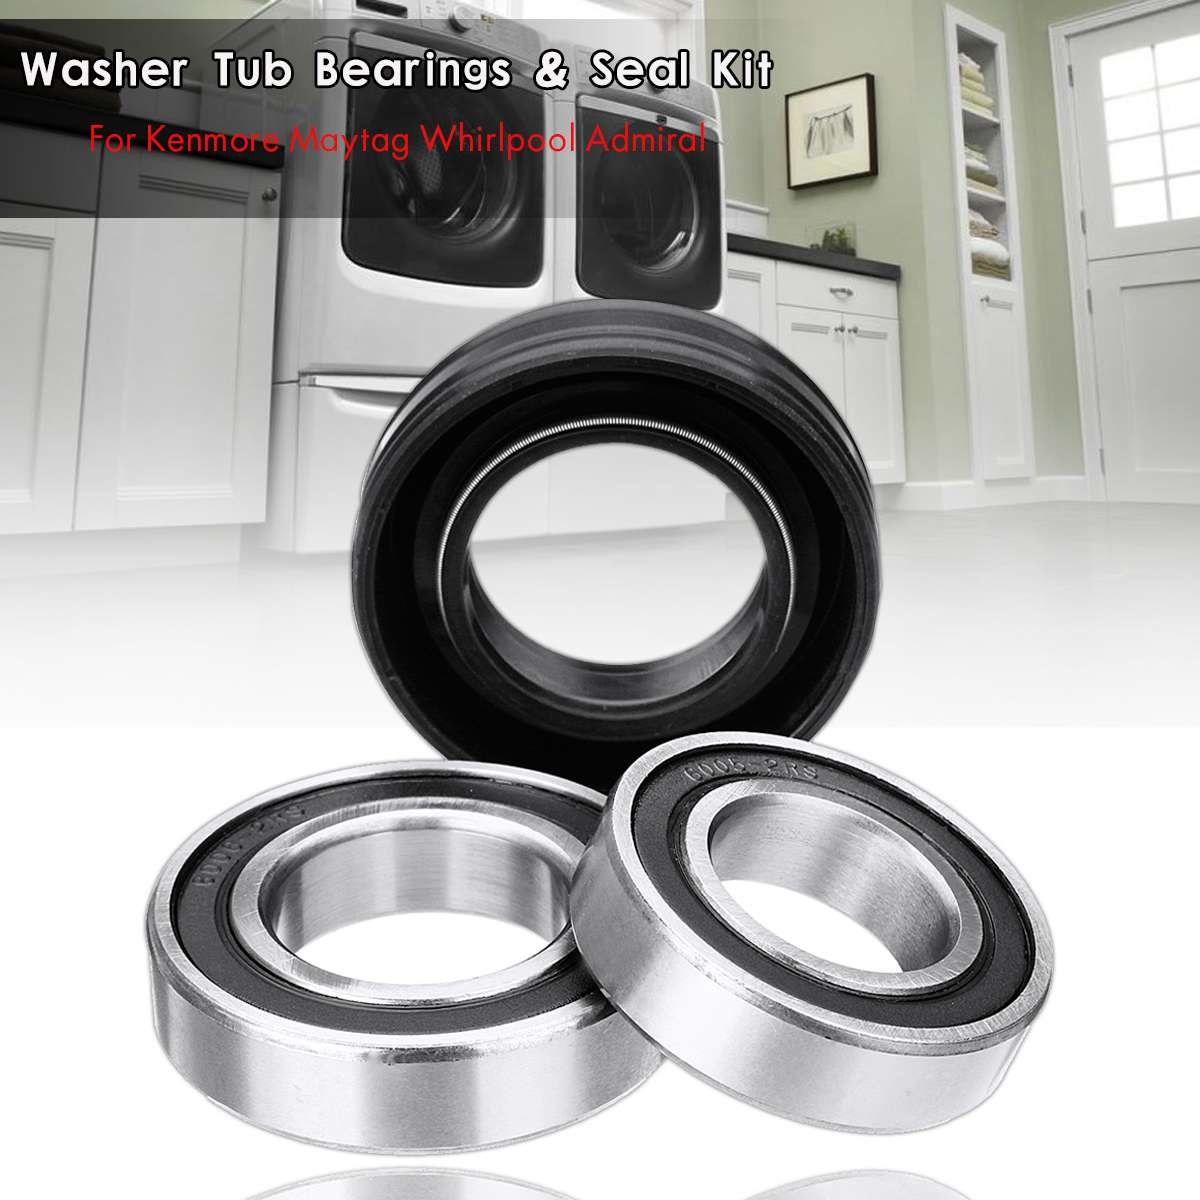 Bearing and Seal Kit for Whirlpool WTW6500WW1 WTW6600SB0 WTW6700TU1 WTW6800WB1